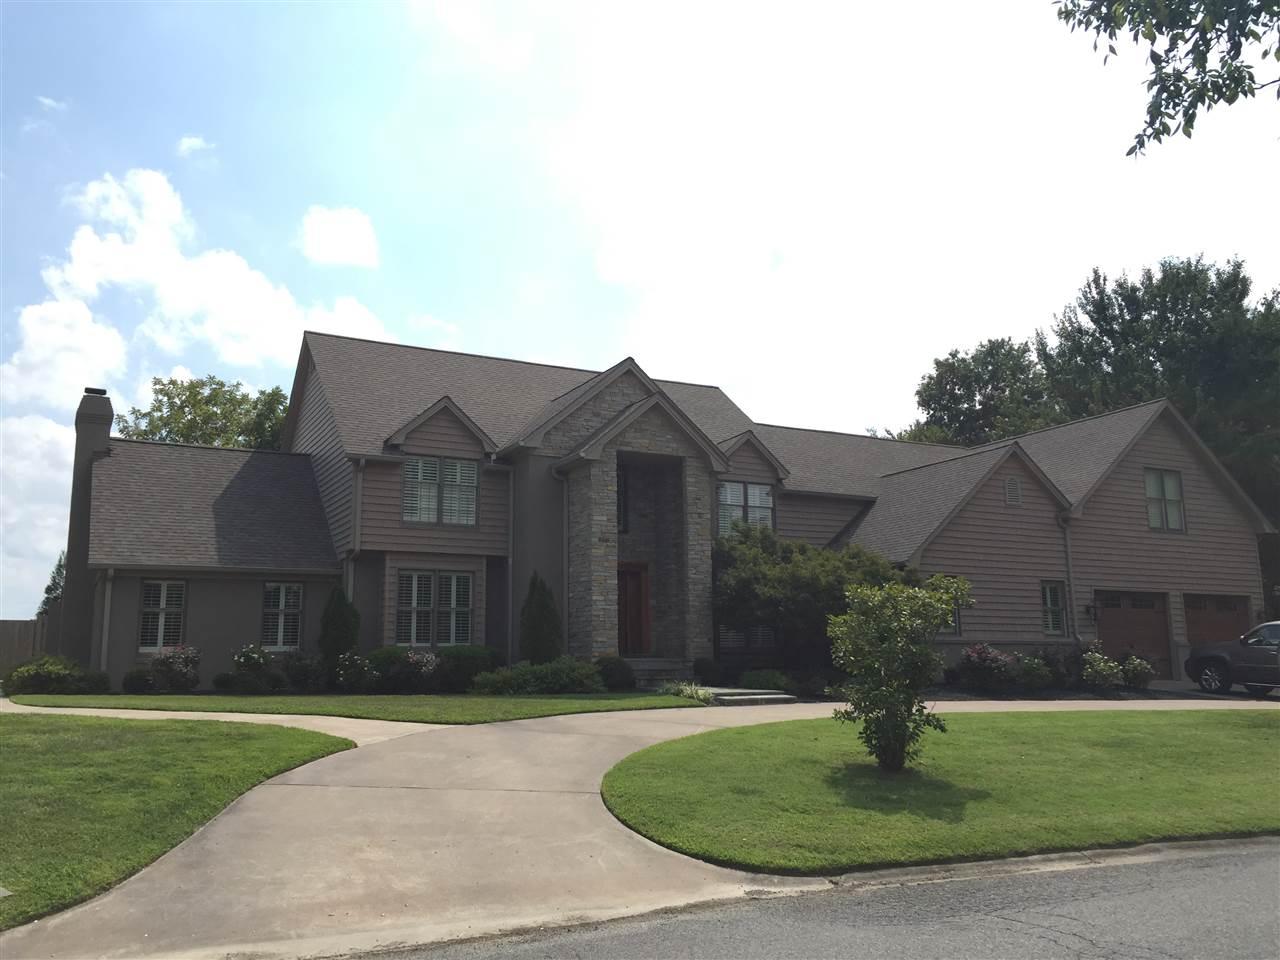 Real Estate for Sale, ListingId: 35179629, Paducah,KY42001